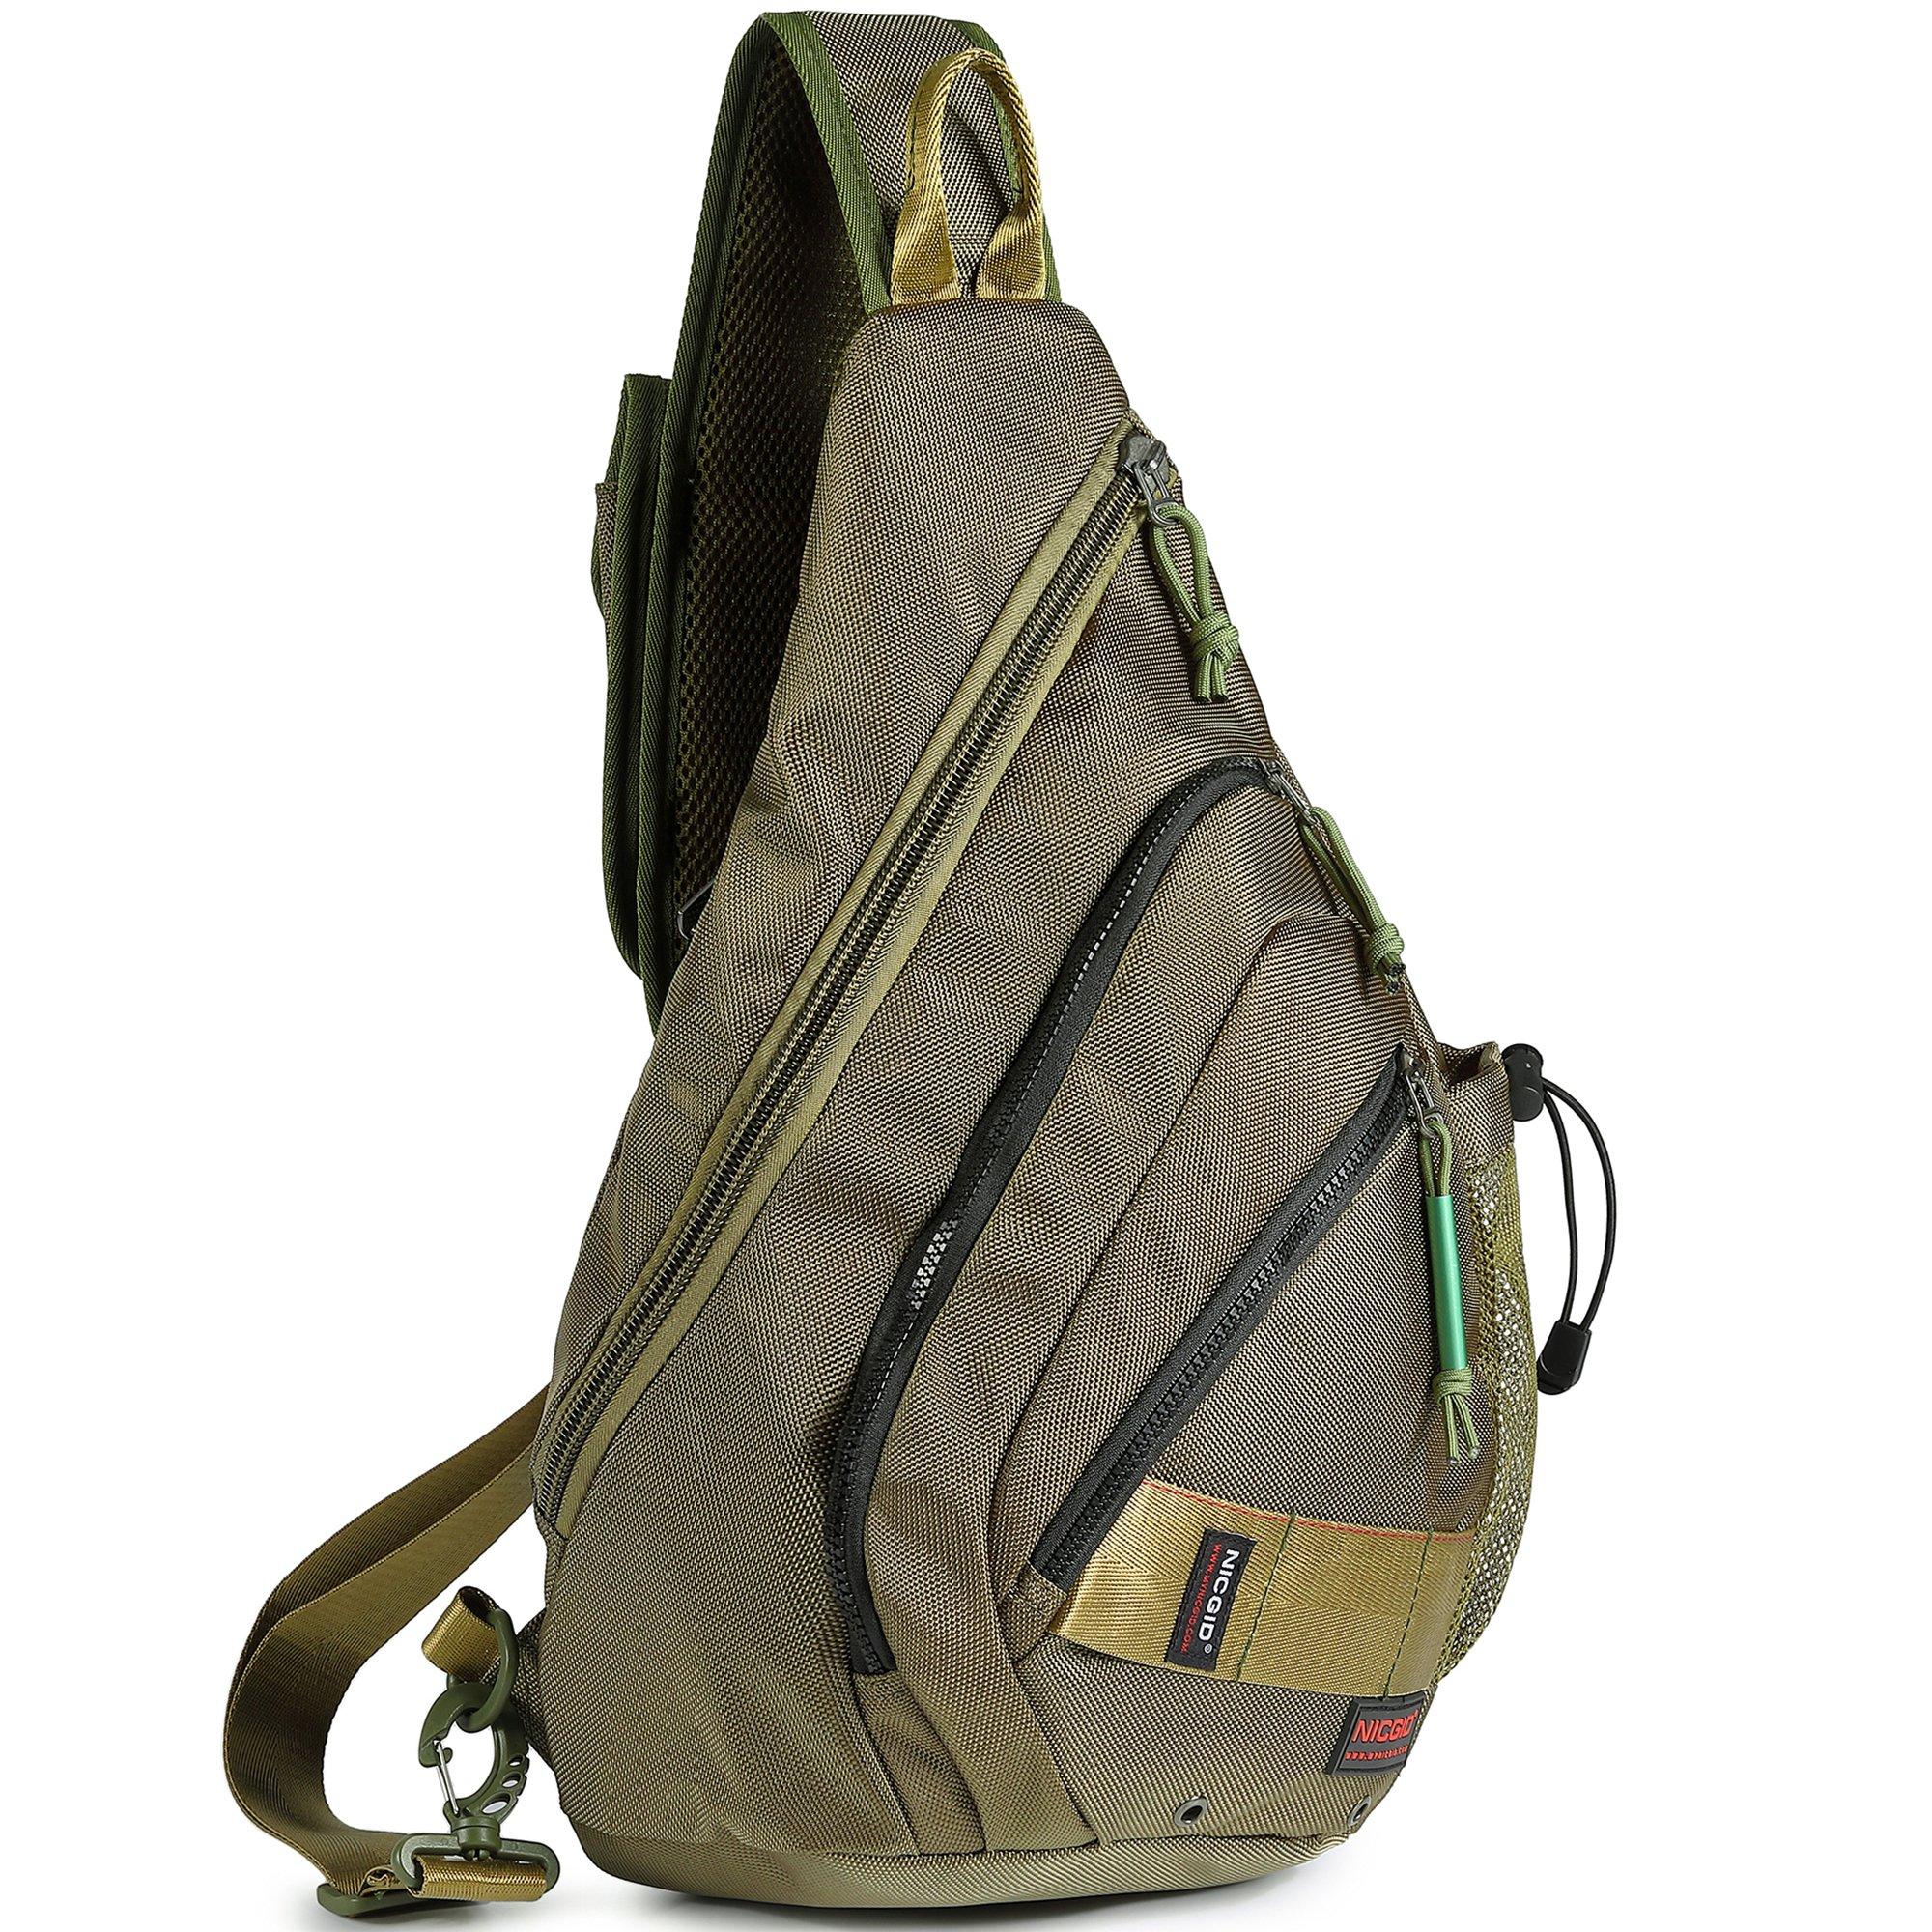 Sling Bag Backpack, Sling Shoulder Bags 13.3-Inch Laptop Travel Outdoors Daypack by Nicgid